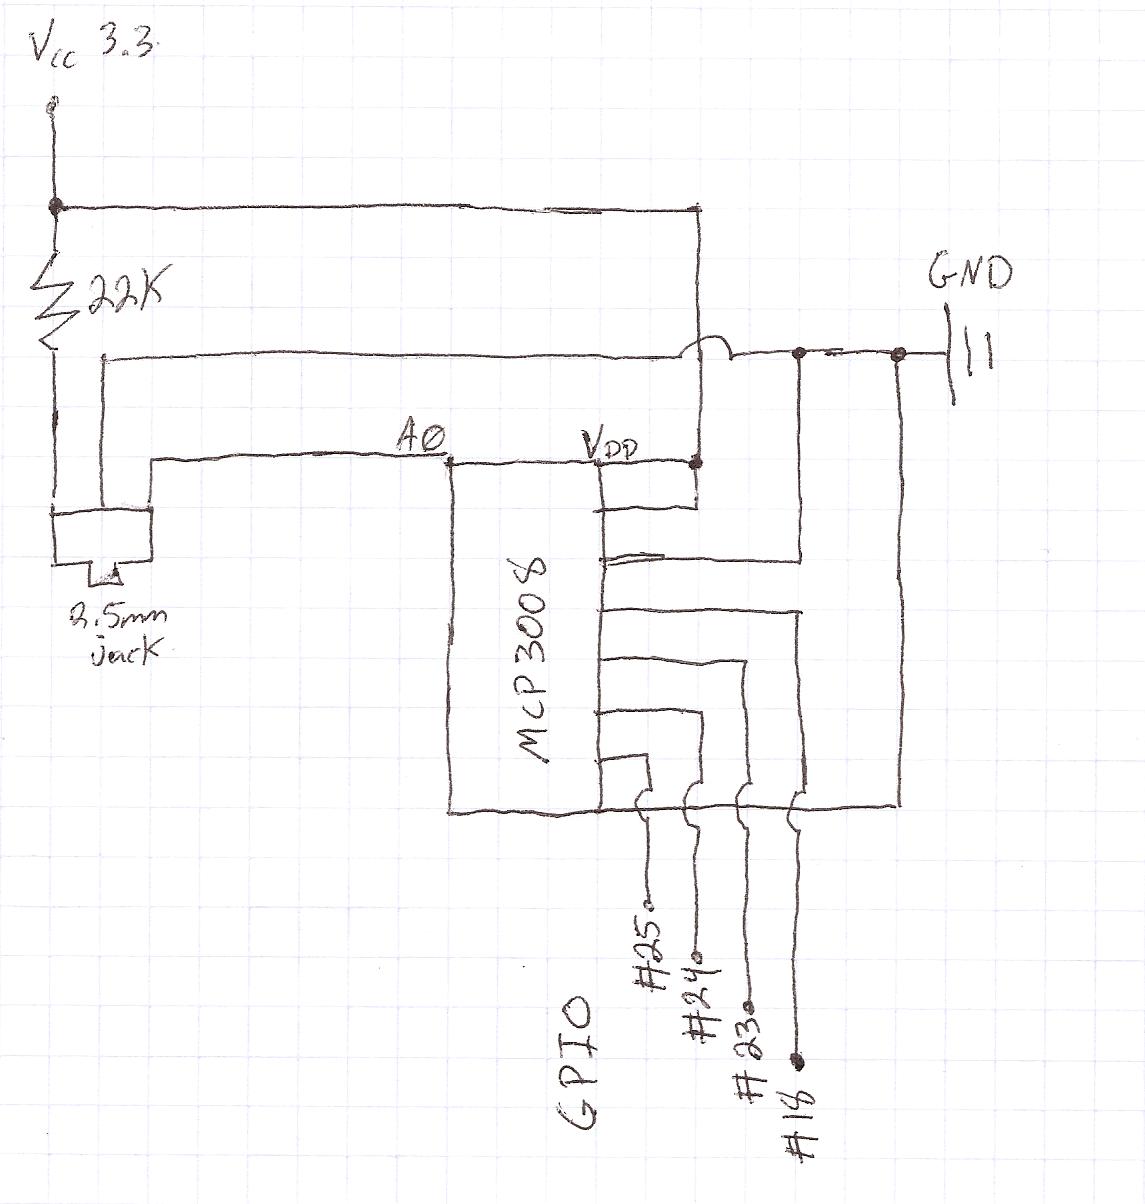 wiringpi mcp3008 circuit